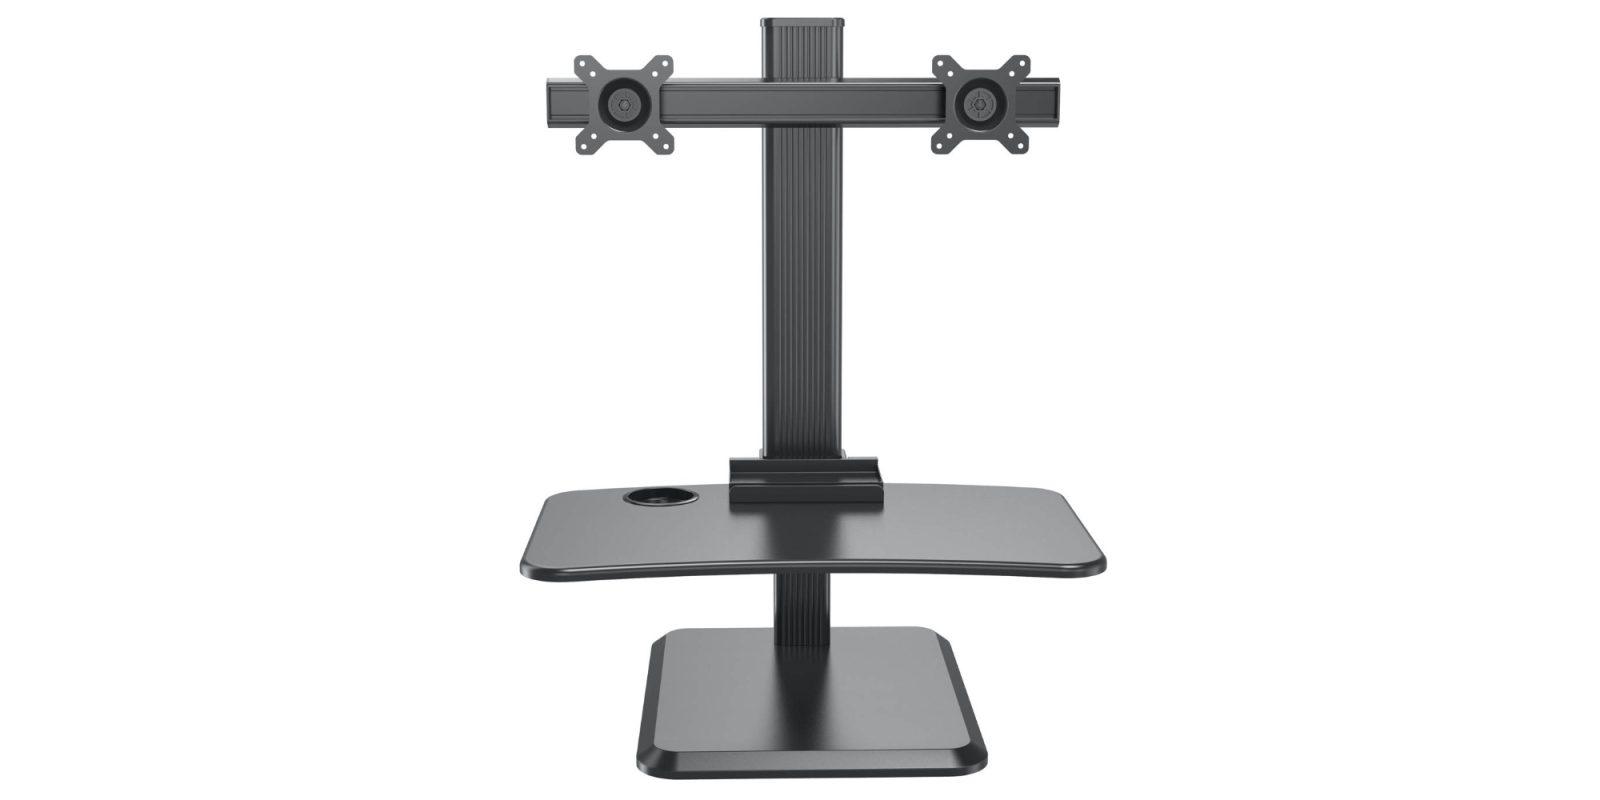 Add Halter's Sit Stand Desk Converter to your workstation for $90 (Reg. $150)